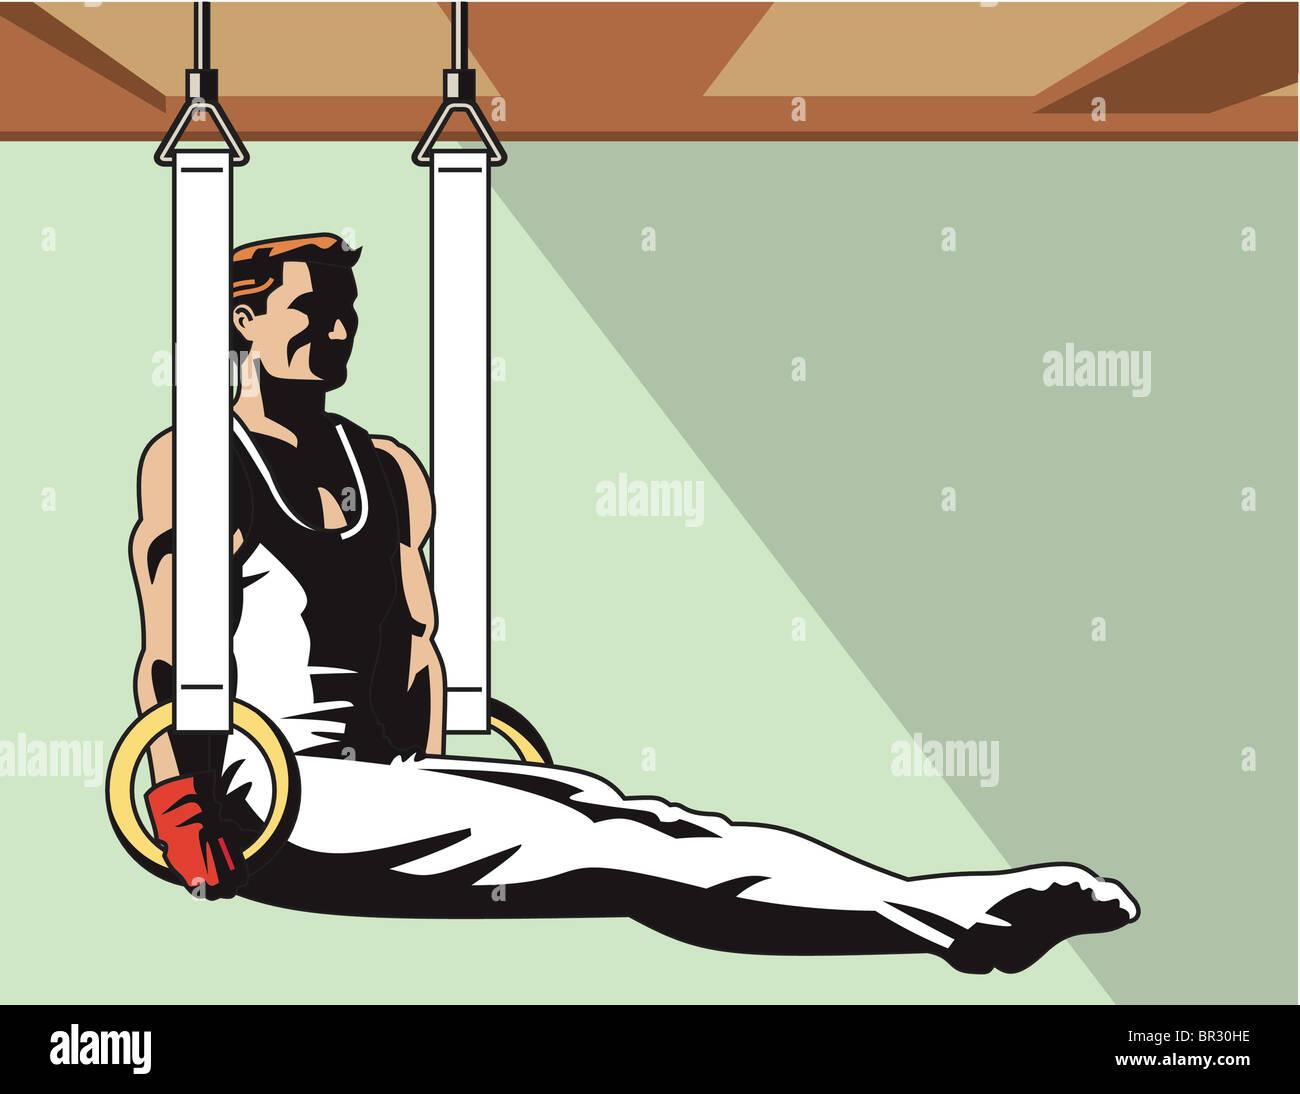 A gymnast balancing on still rings - Stock Image